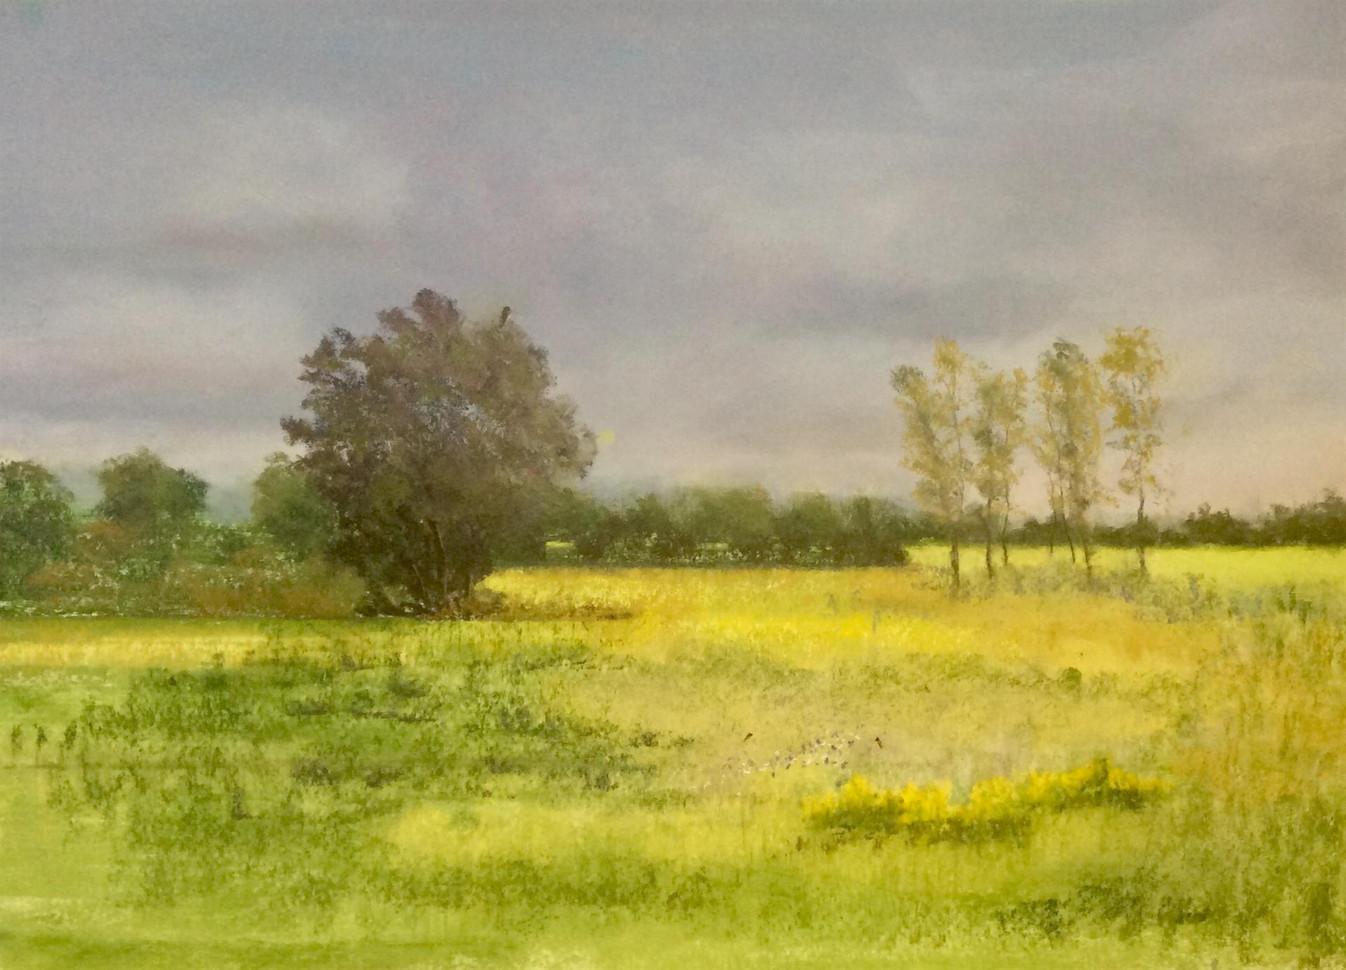 "Nina Thomson (Sacramento), Hawk Hunting Grounds, 2020 Pastel, 18"" x 24"" $225"